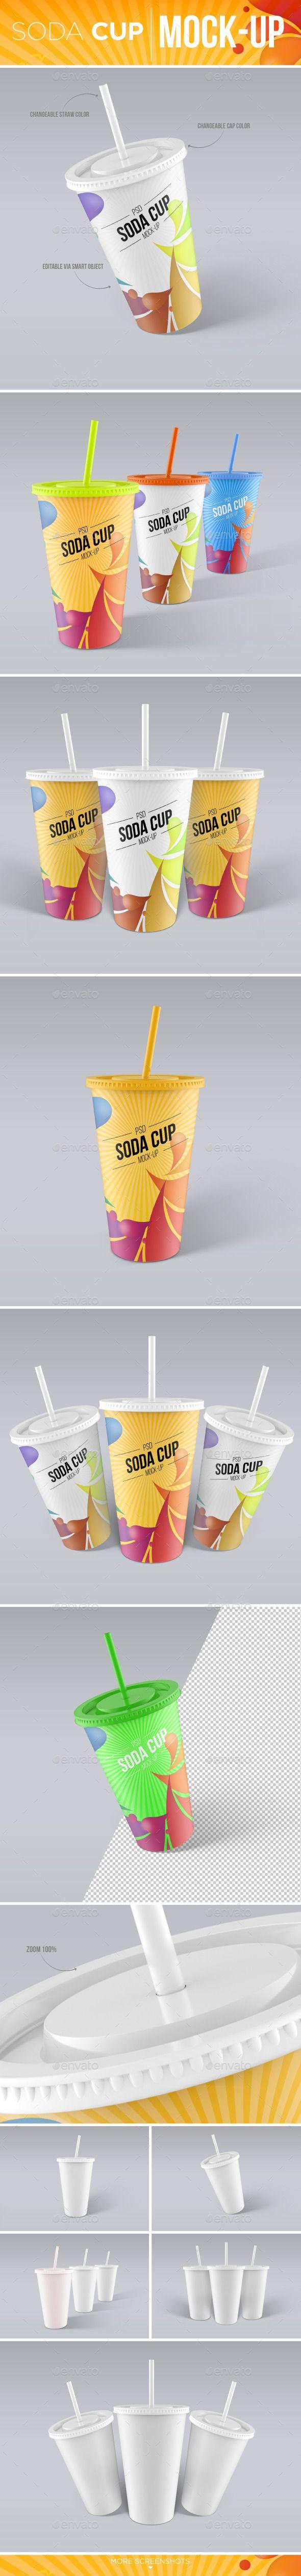 Soda Cup Mock-Up #design Download: http://graphicriver.net/item/soda-cup-mockup/12268553?ref=ksioks